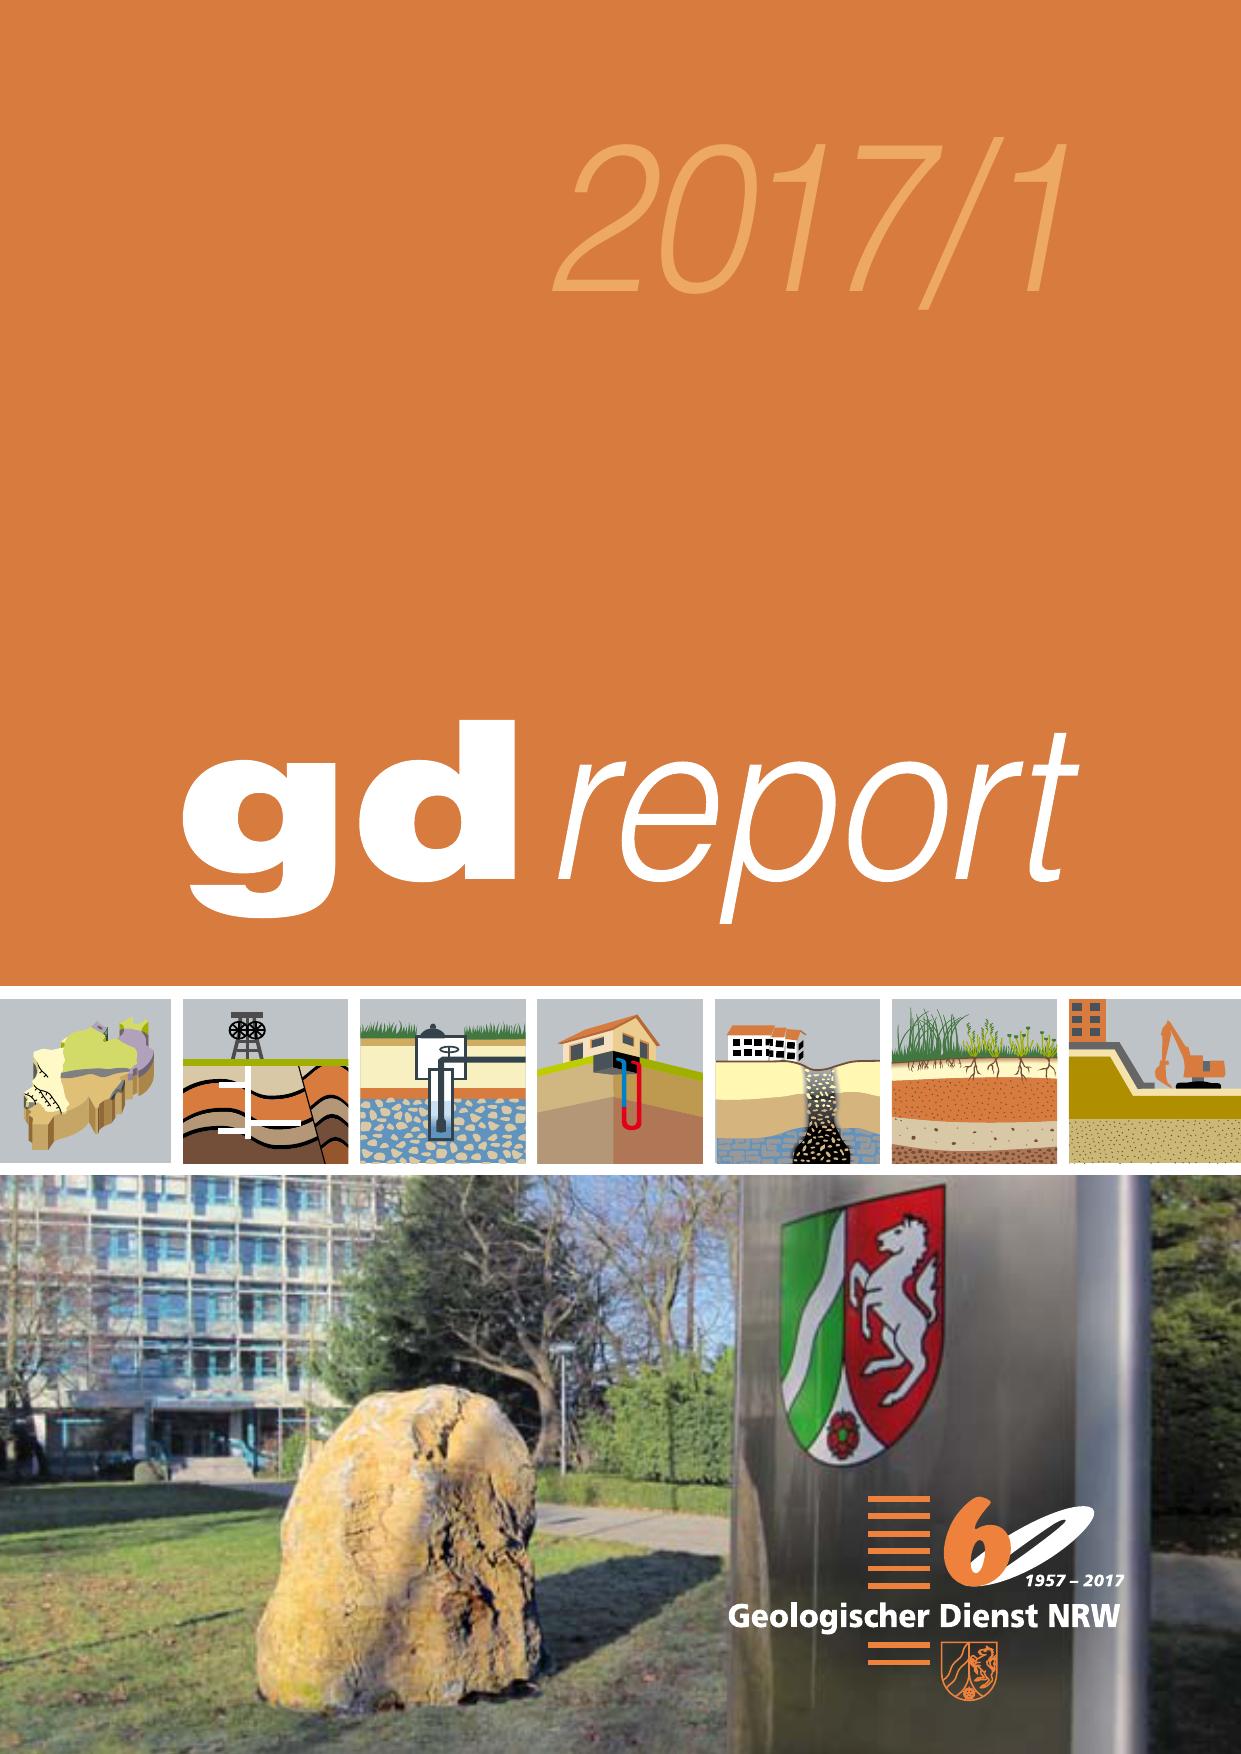 Geologische Karte Ruhrgebiet.Rep17a Web Layout 1 Geologischer Dienst Nrw